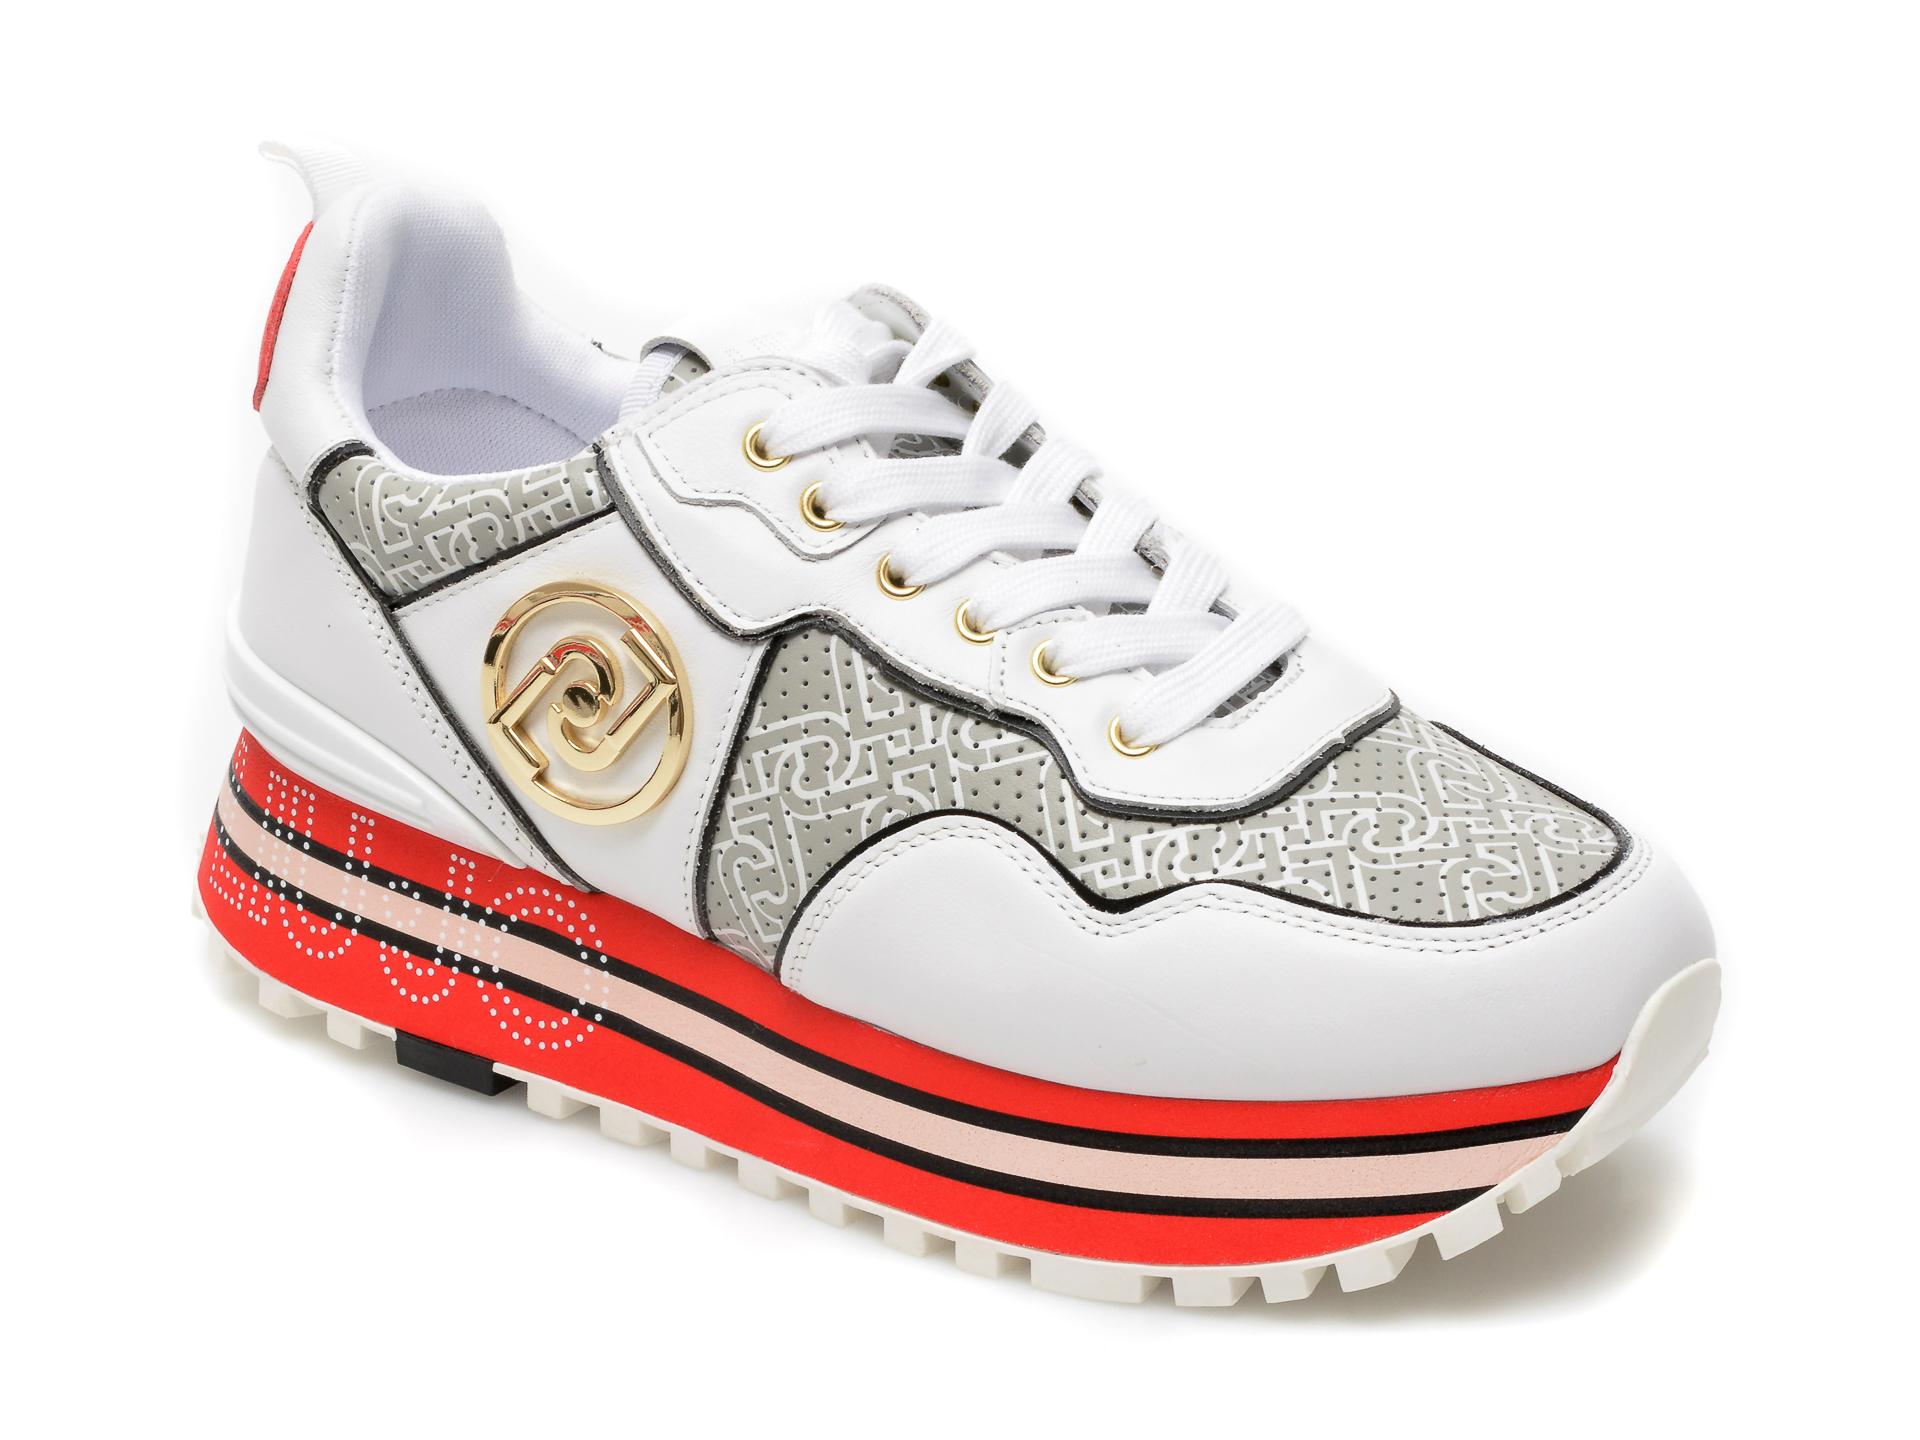 Pantofi sport LIU JO albi, Maxi Wonder 24, din piele naturala